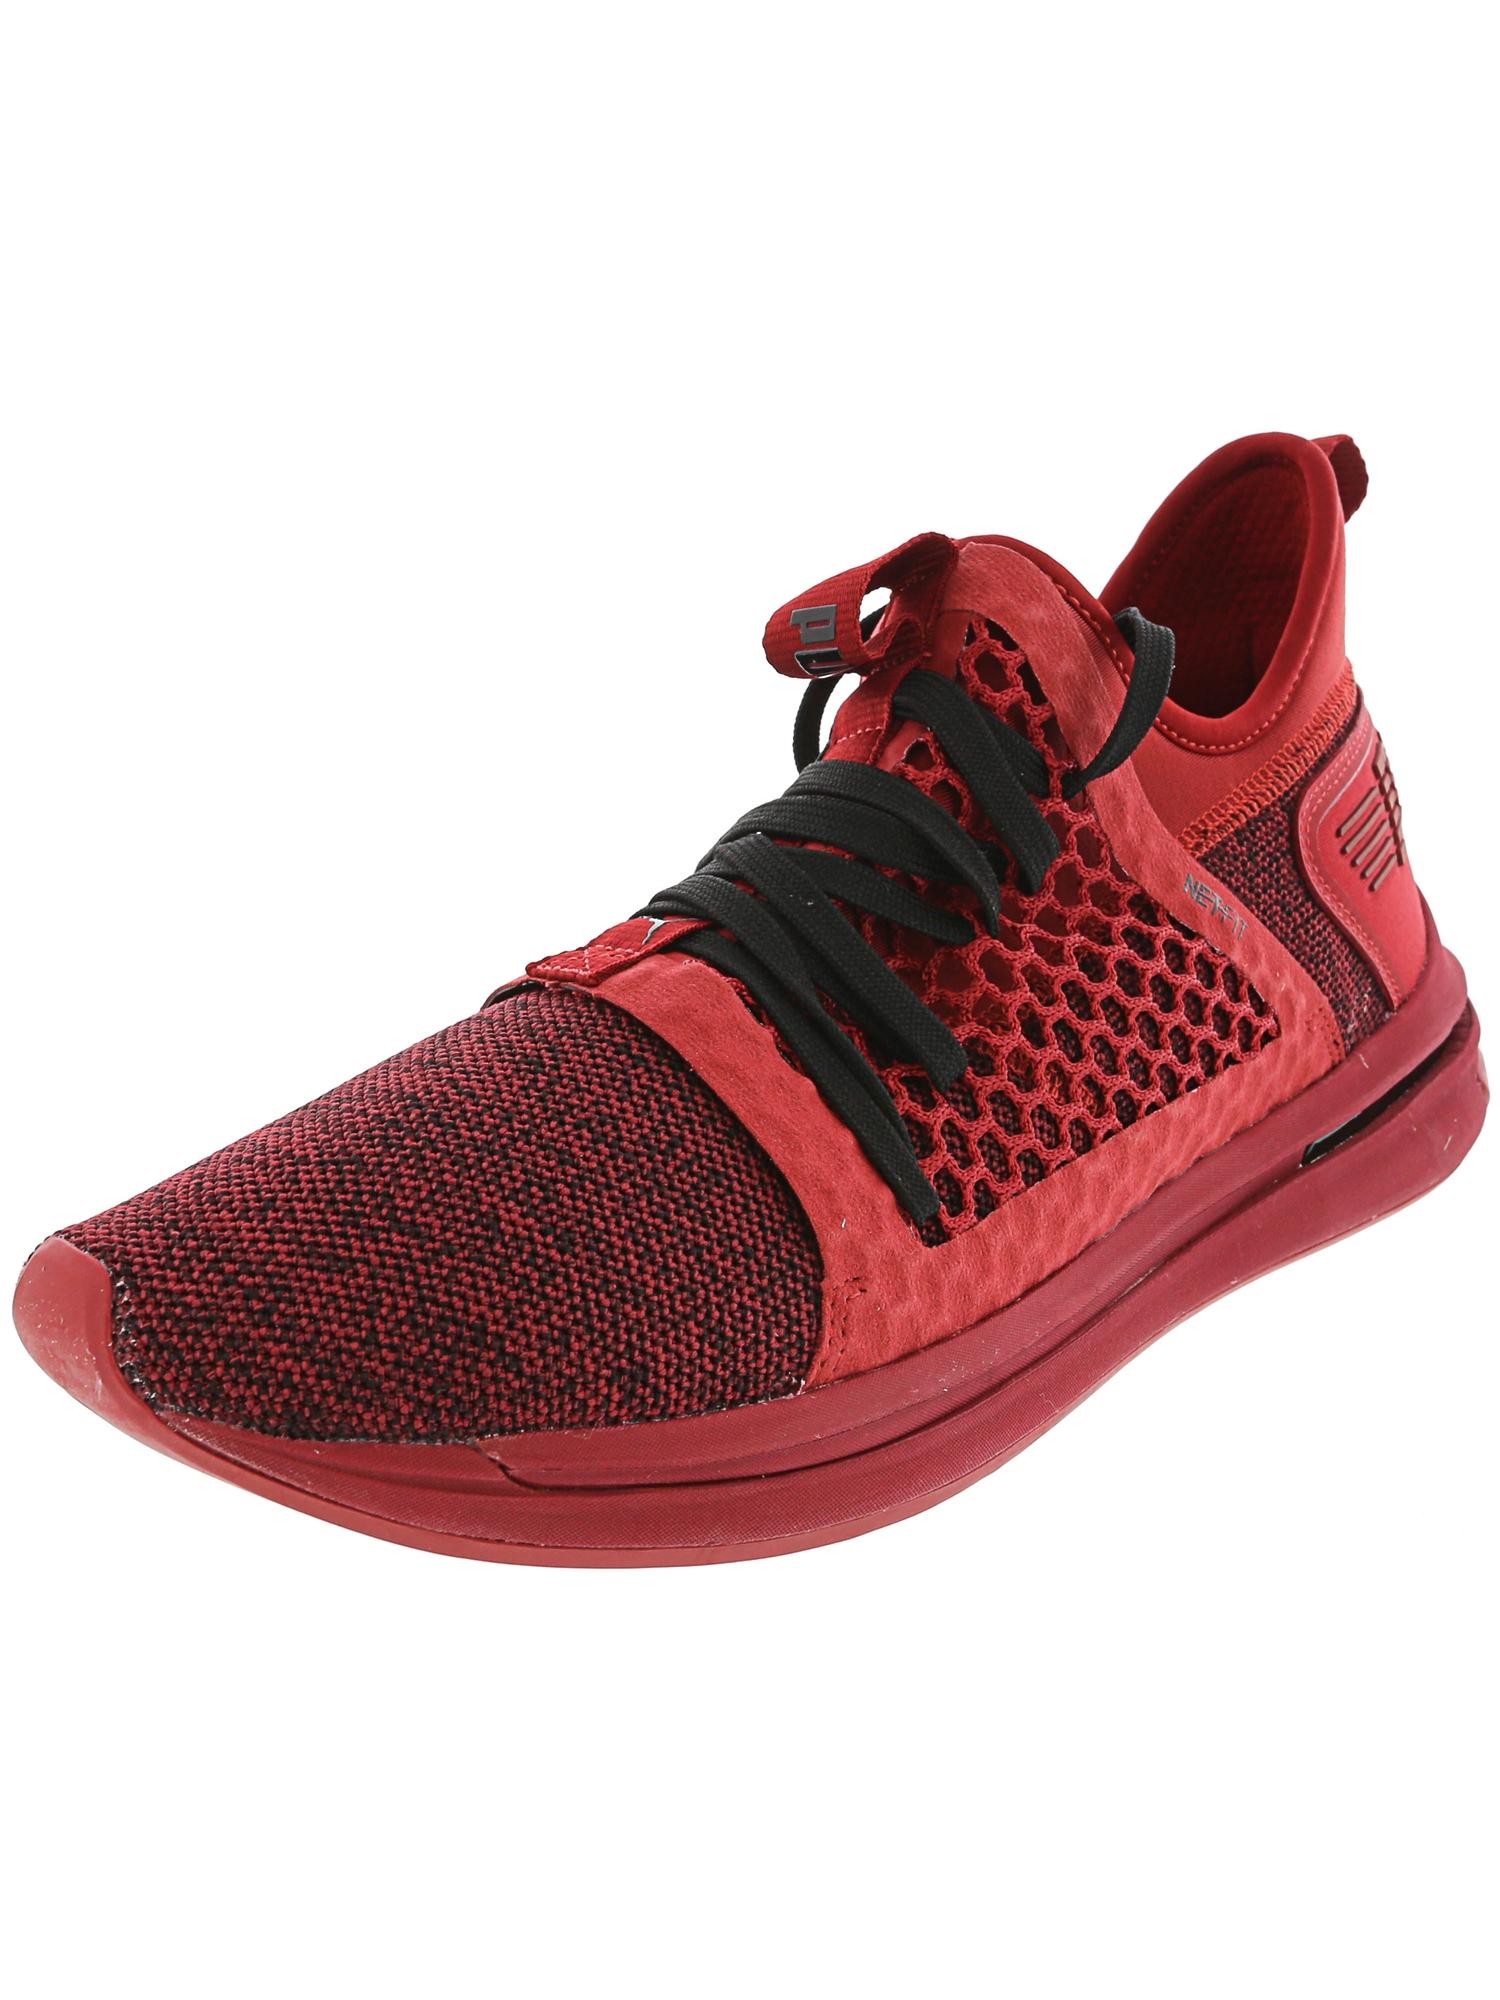 Puma Men's Ignite Limitless Sr Netfit Red Dahlia Ankle-High Fashion Sneaker - 12M